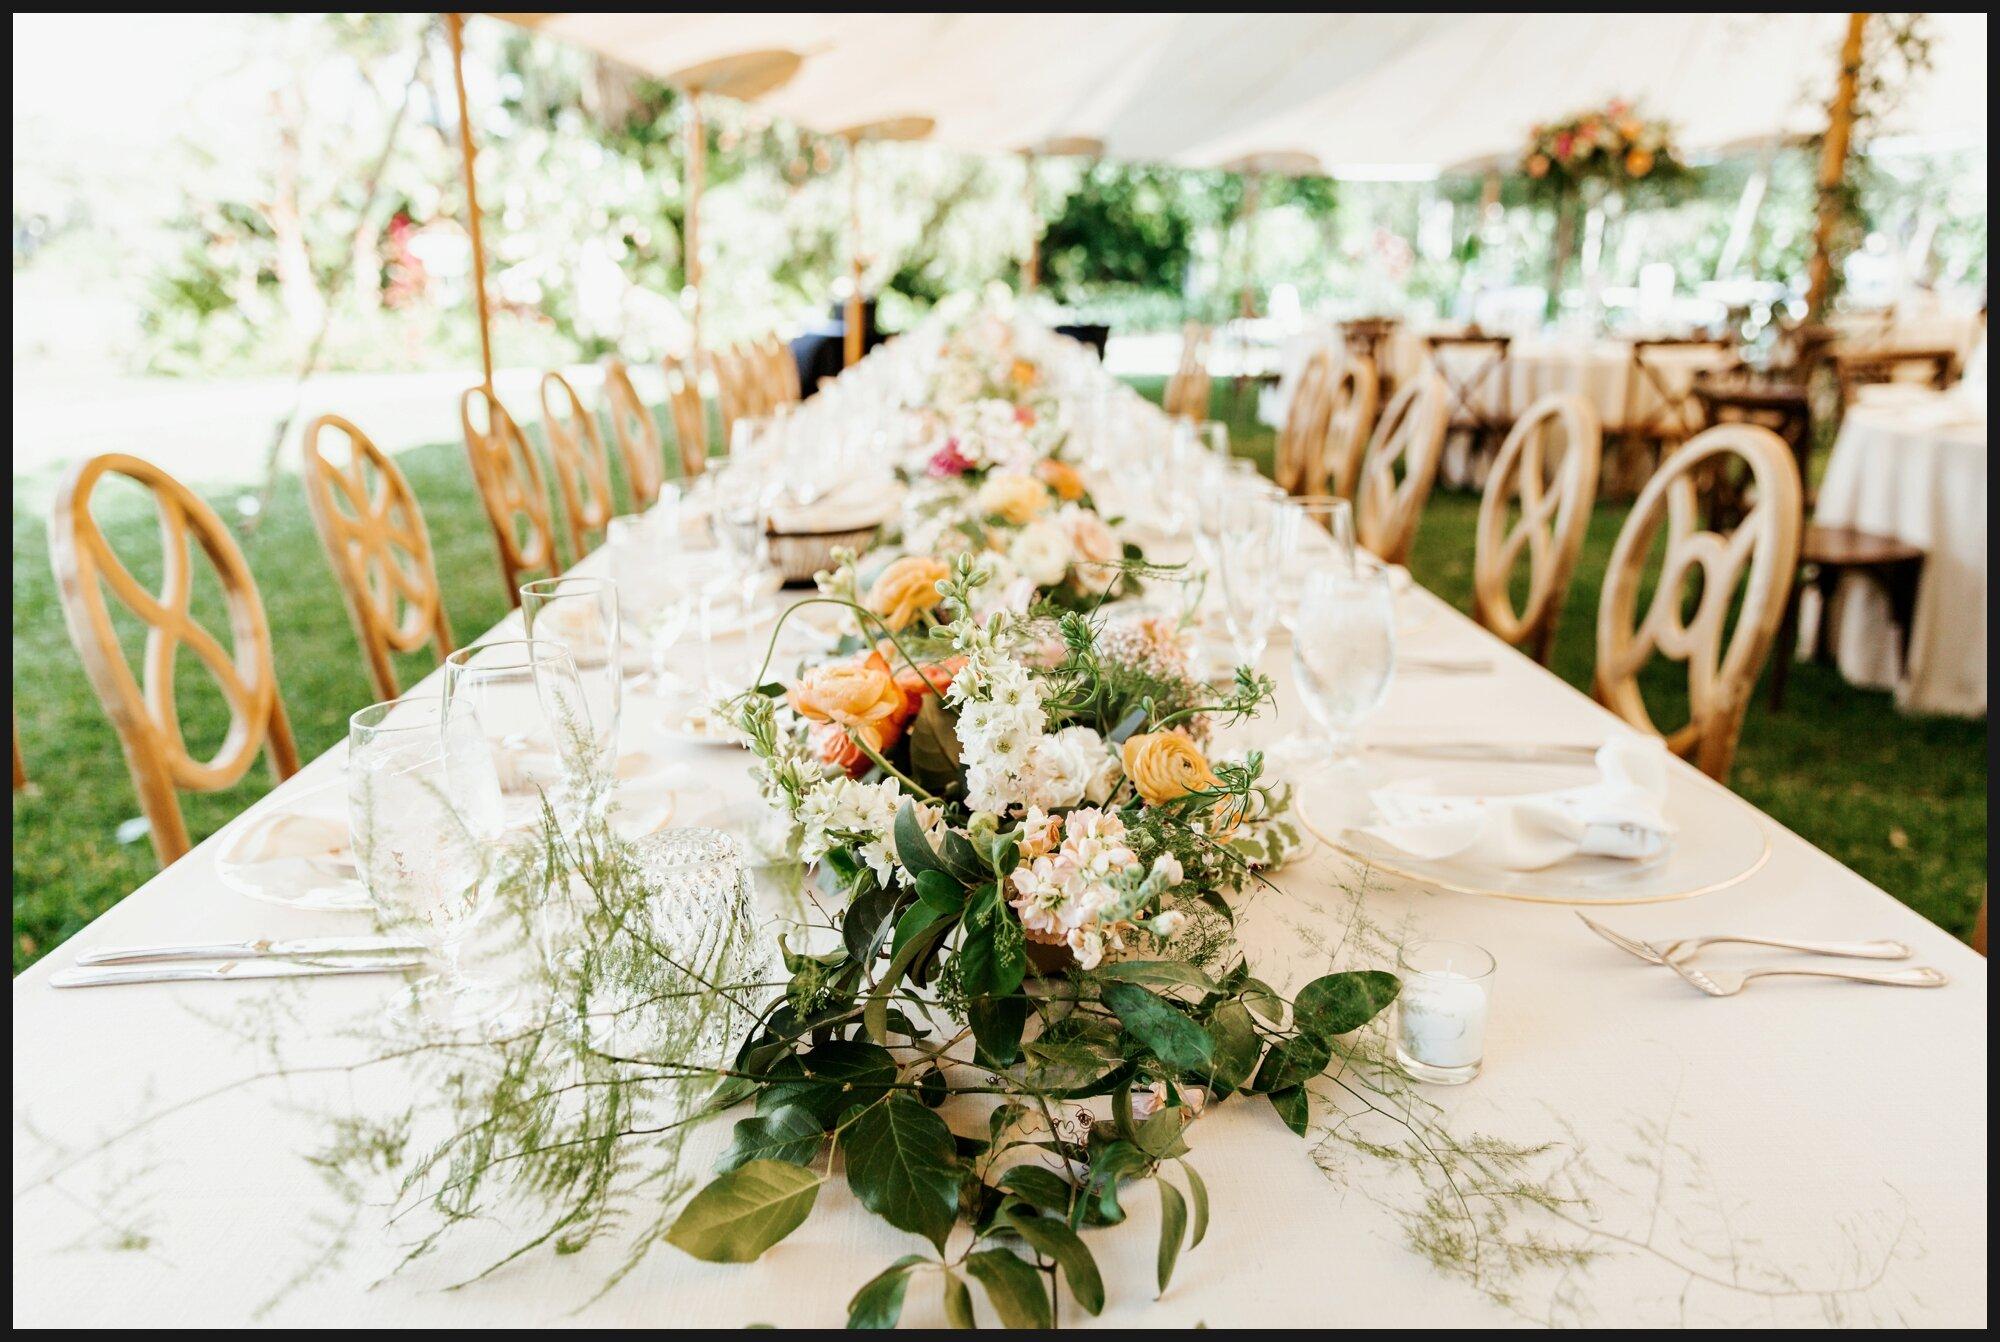 Orlando-Wedding-Photographer-destination-wedding-photographer-florida-wedding-photographer-hawaii-wedding-photographer_0765.jpg